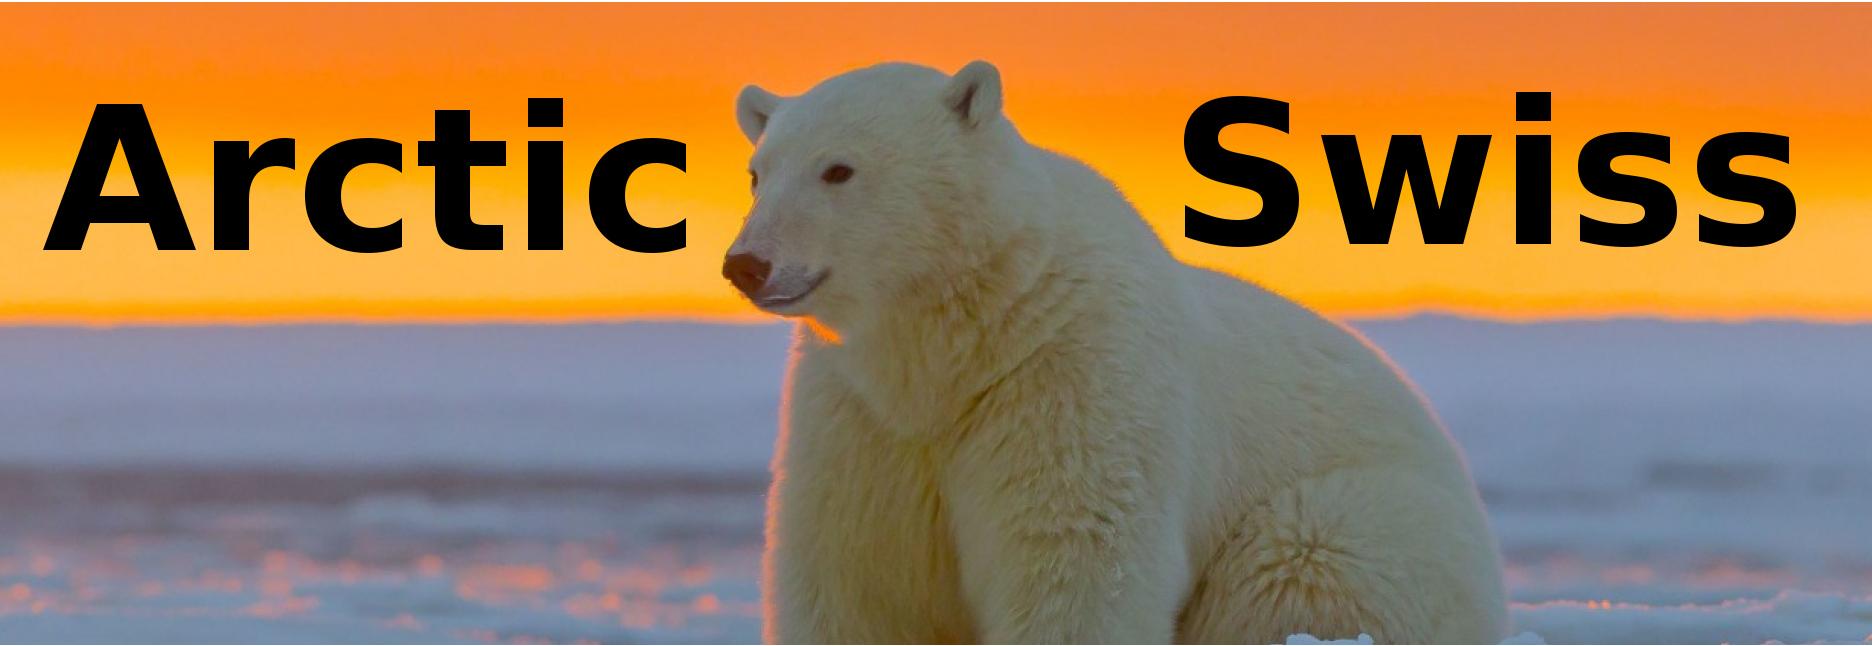 arcticswissheader2.jpg